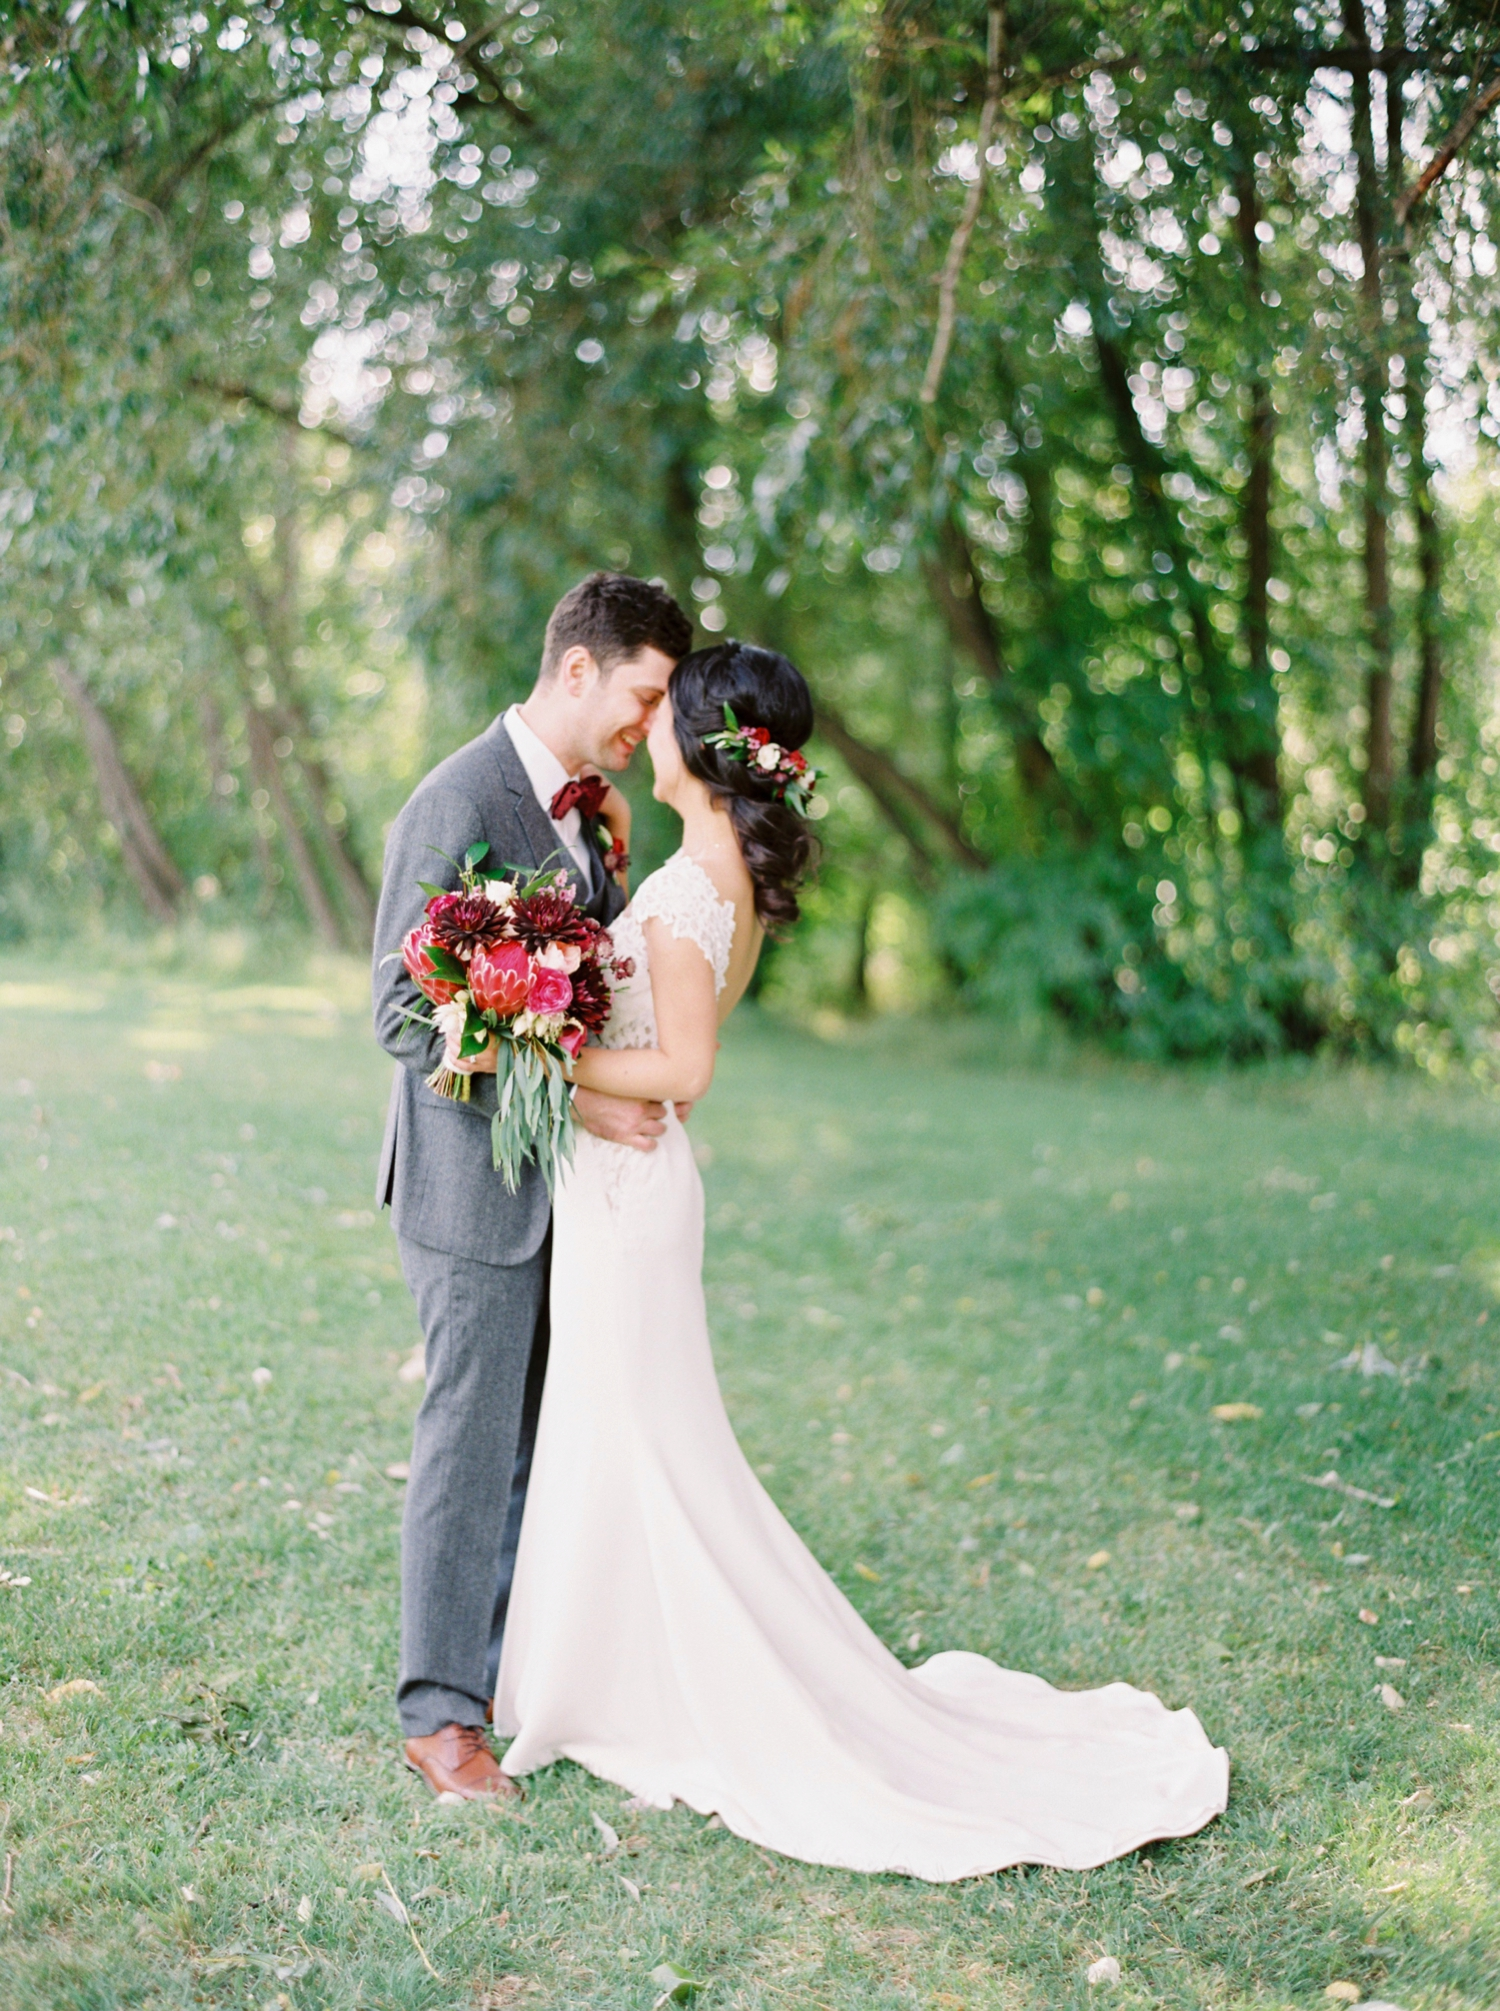 Calgary wedding photographer | fine art film photography | Calgary Wedding Photographers | Calgary couples photographer | Justine Milton Photography | outdoor photographer | couple kissing